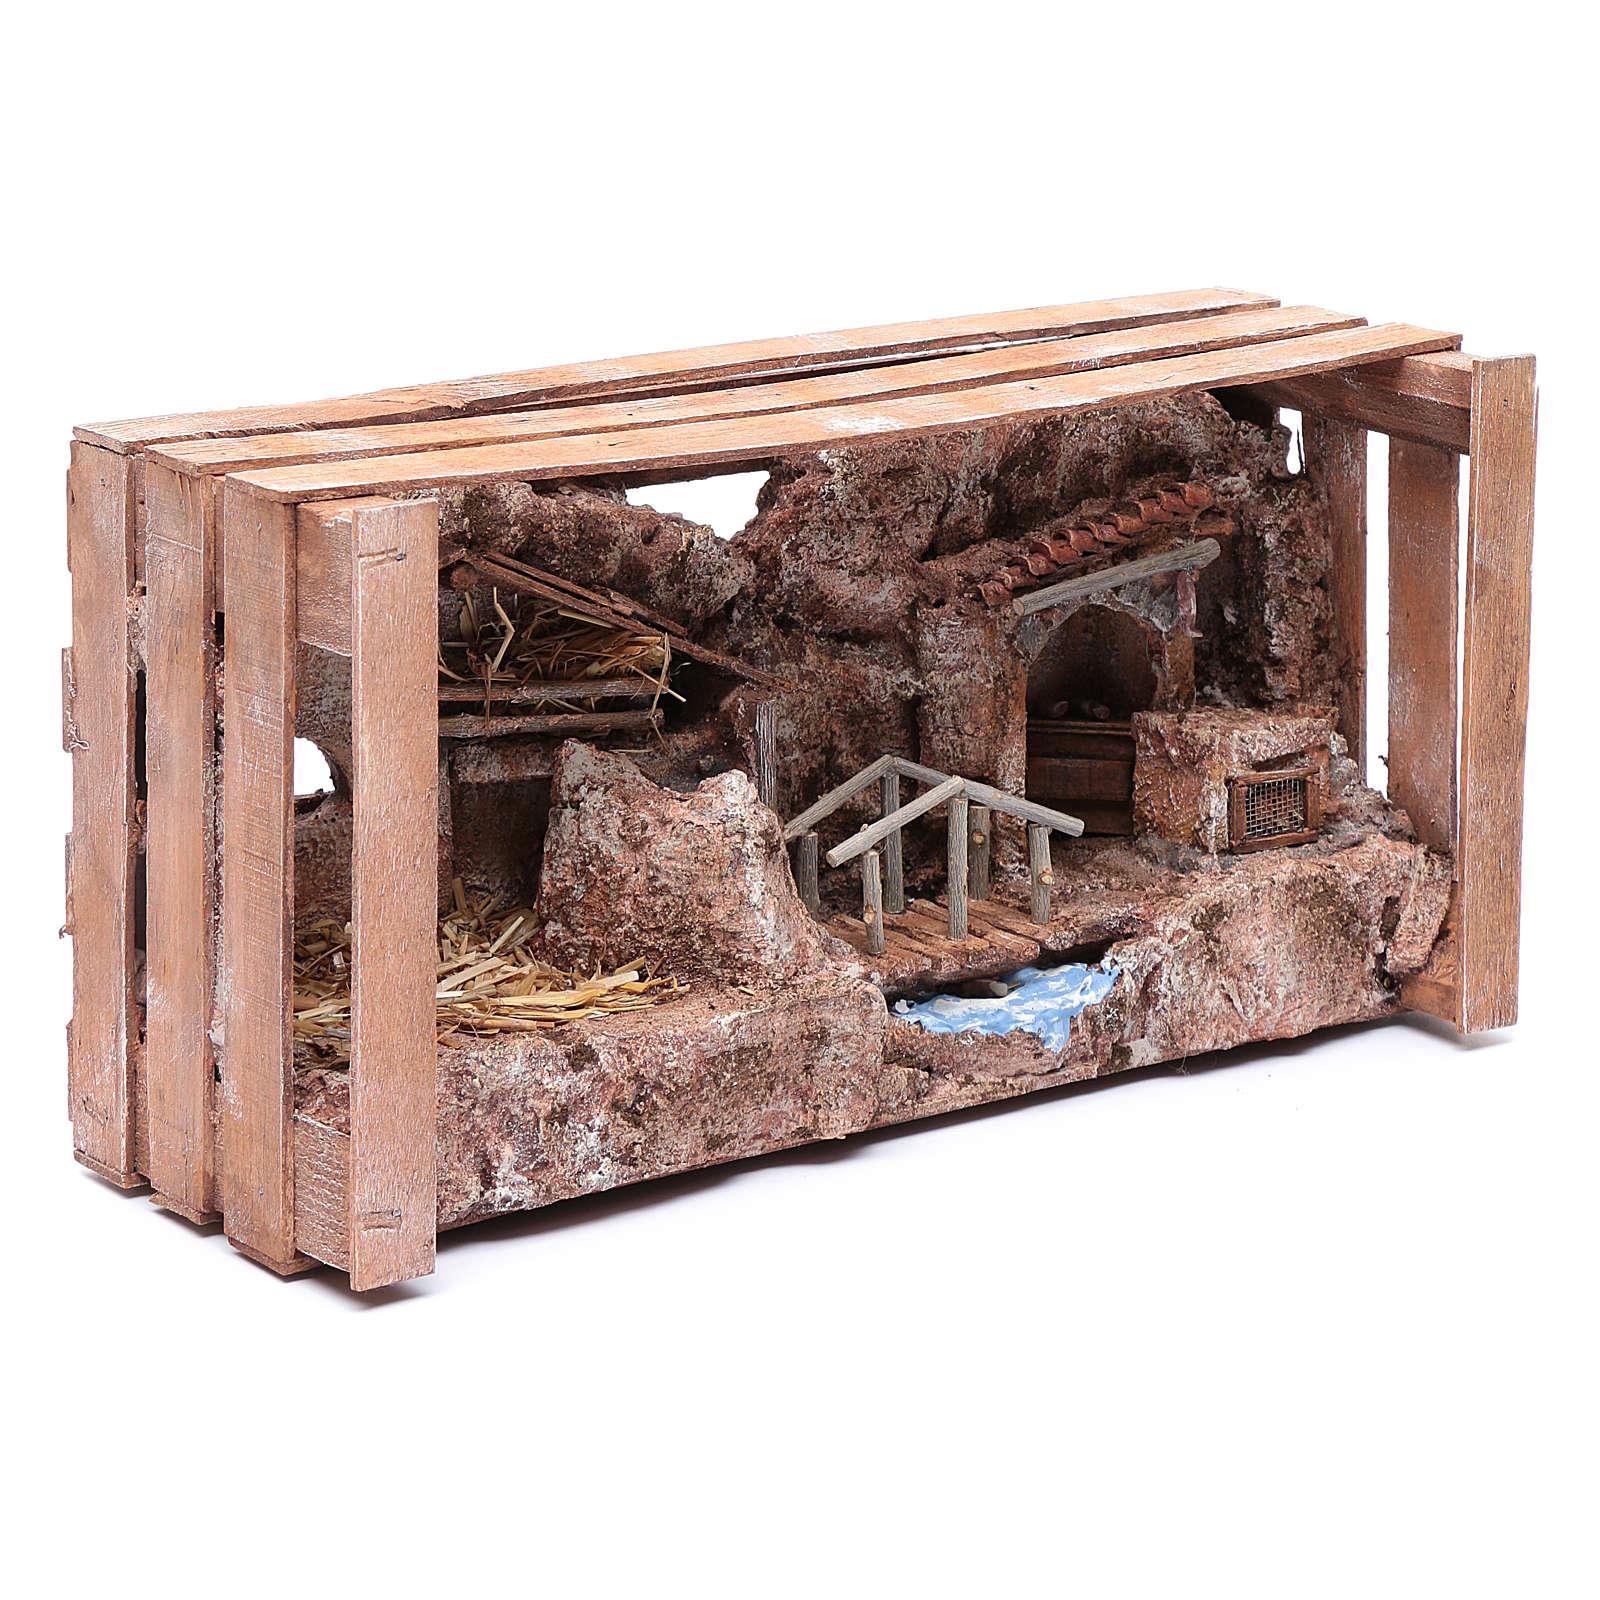 cave in wooden box for nativity scene 20x35x15 cm 4